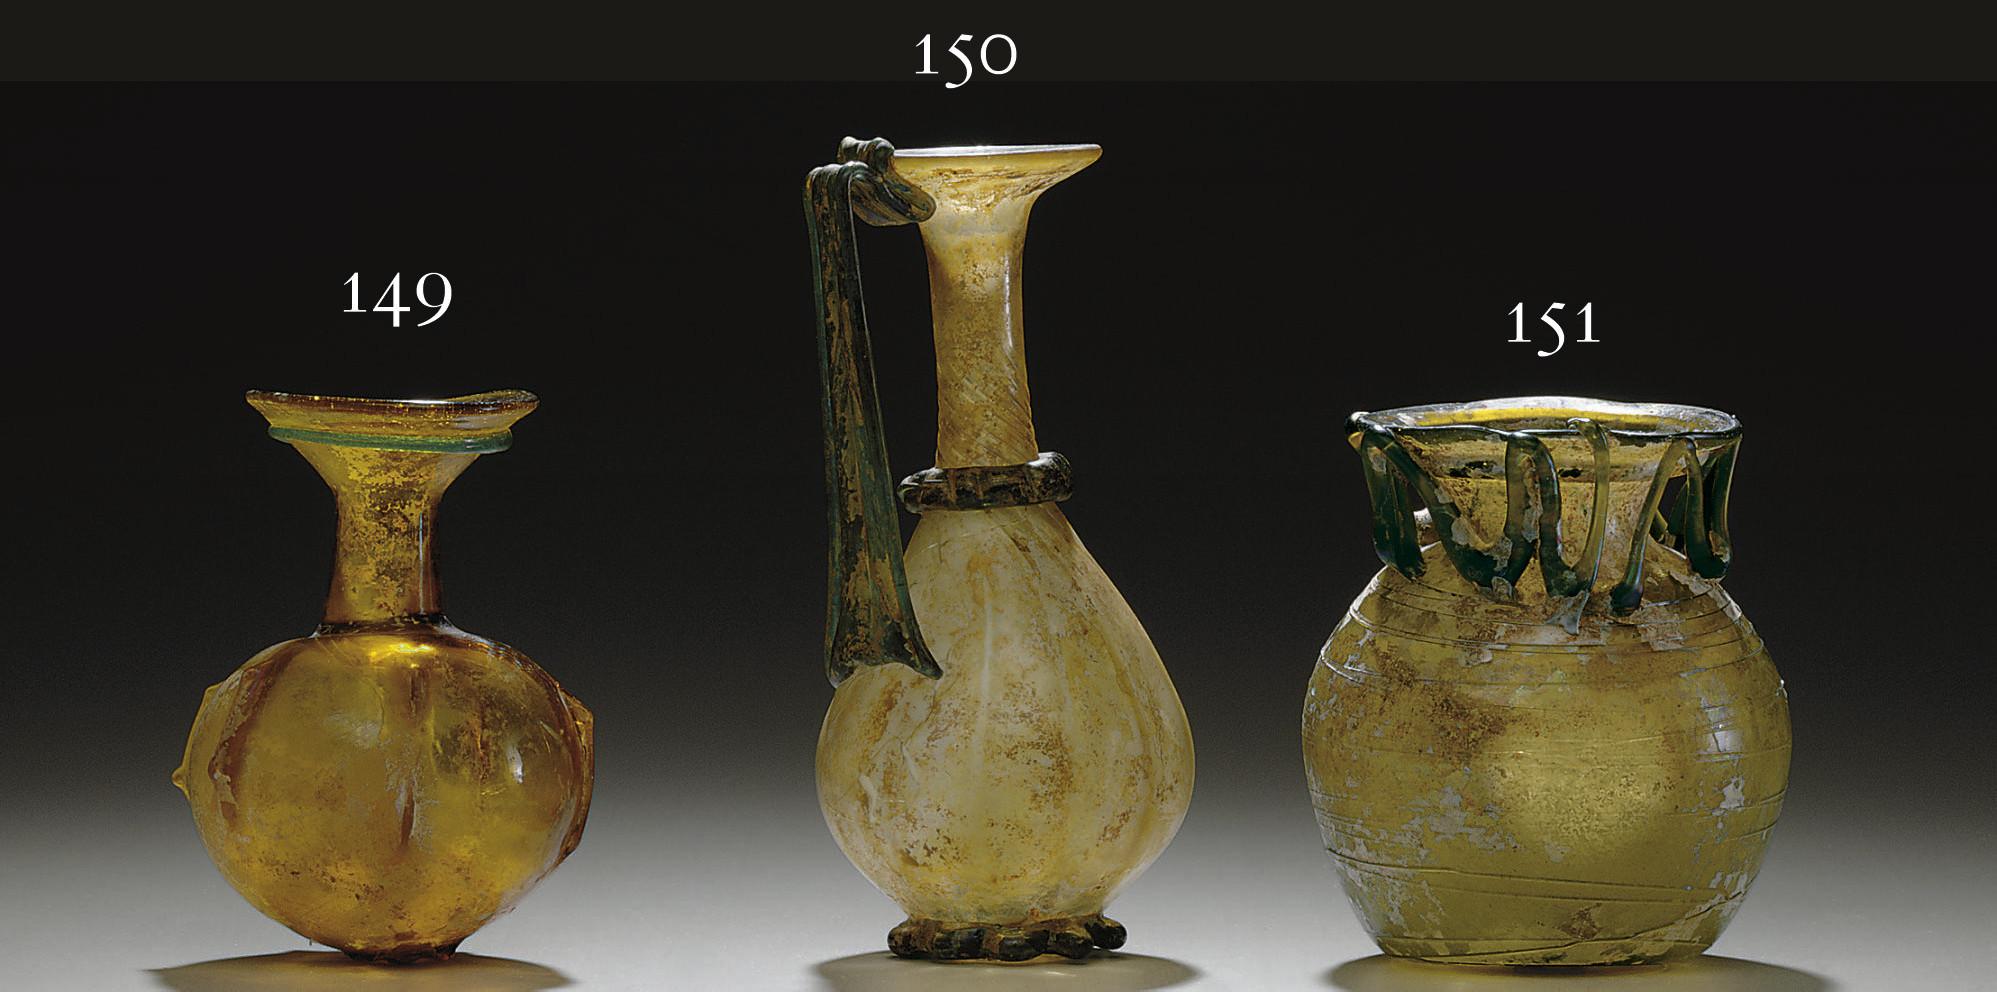 A ROMAN GLASS POMEGRANATE-SHAP